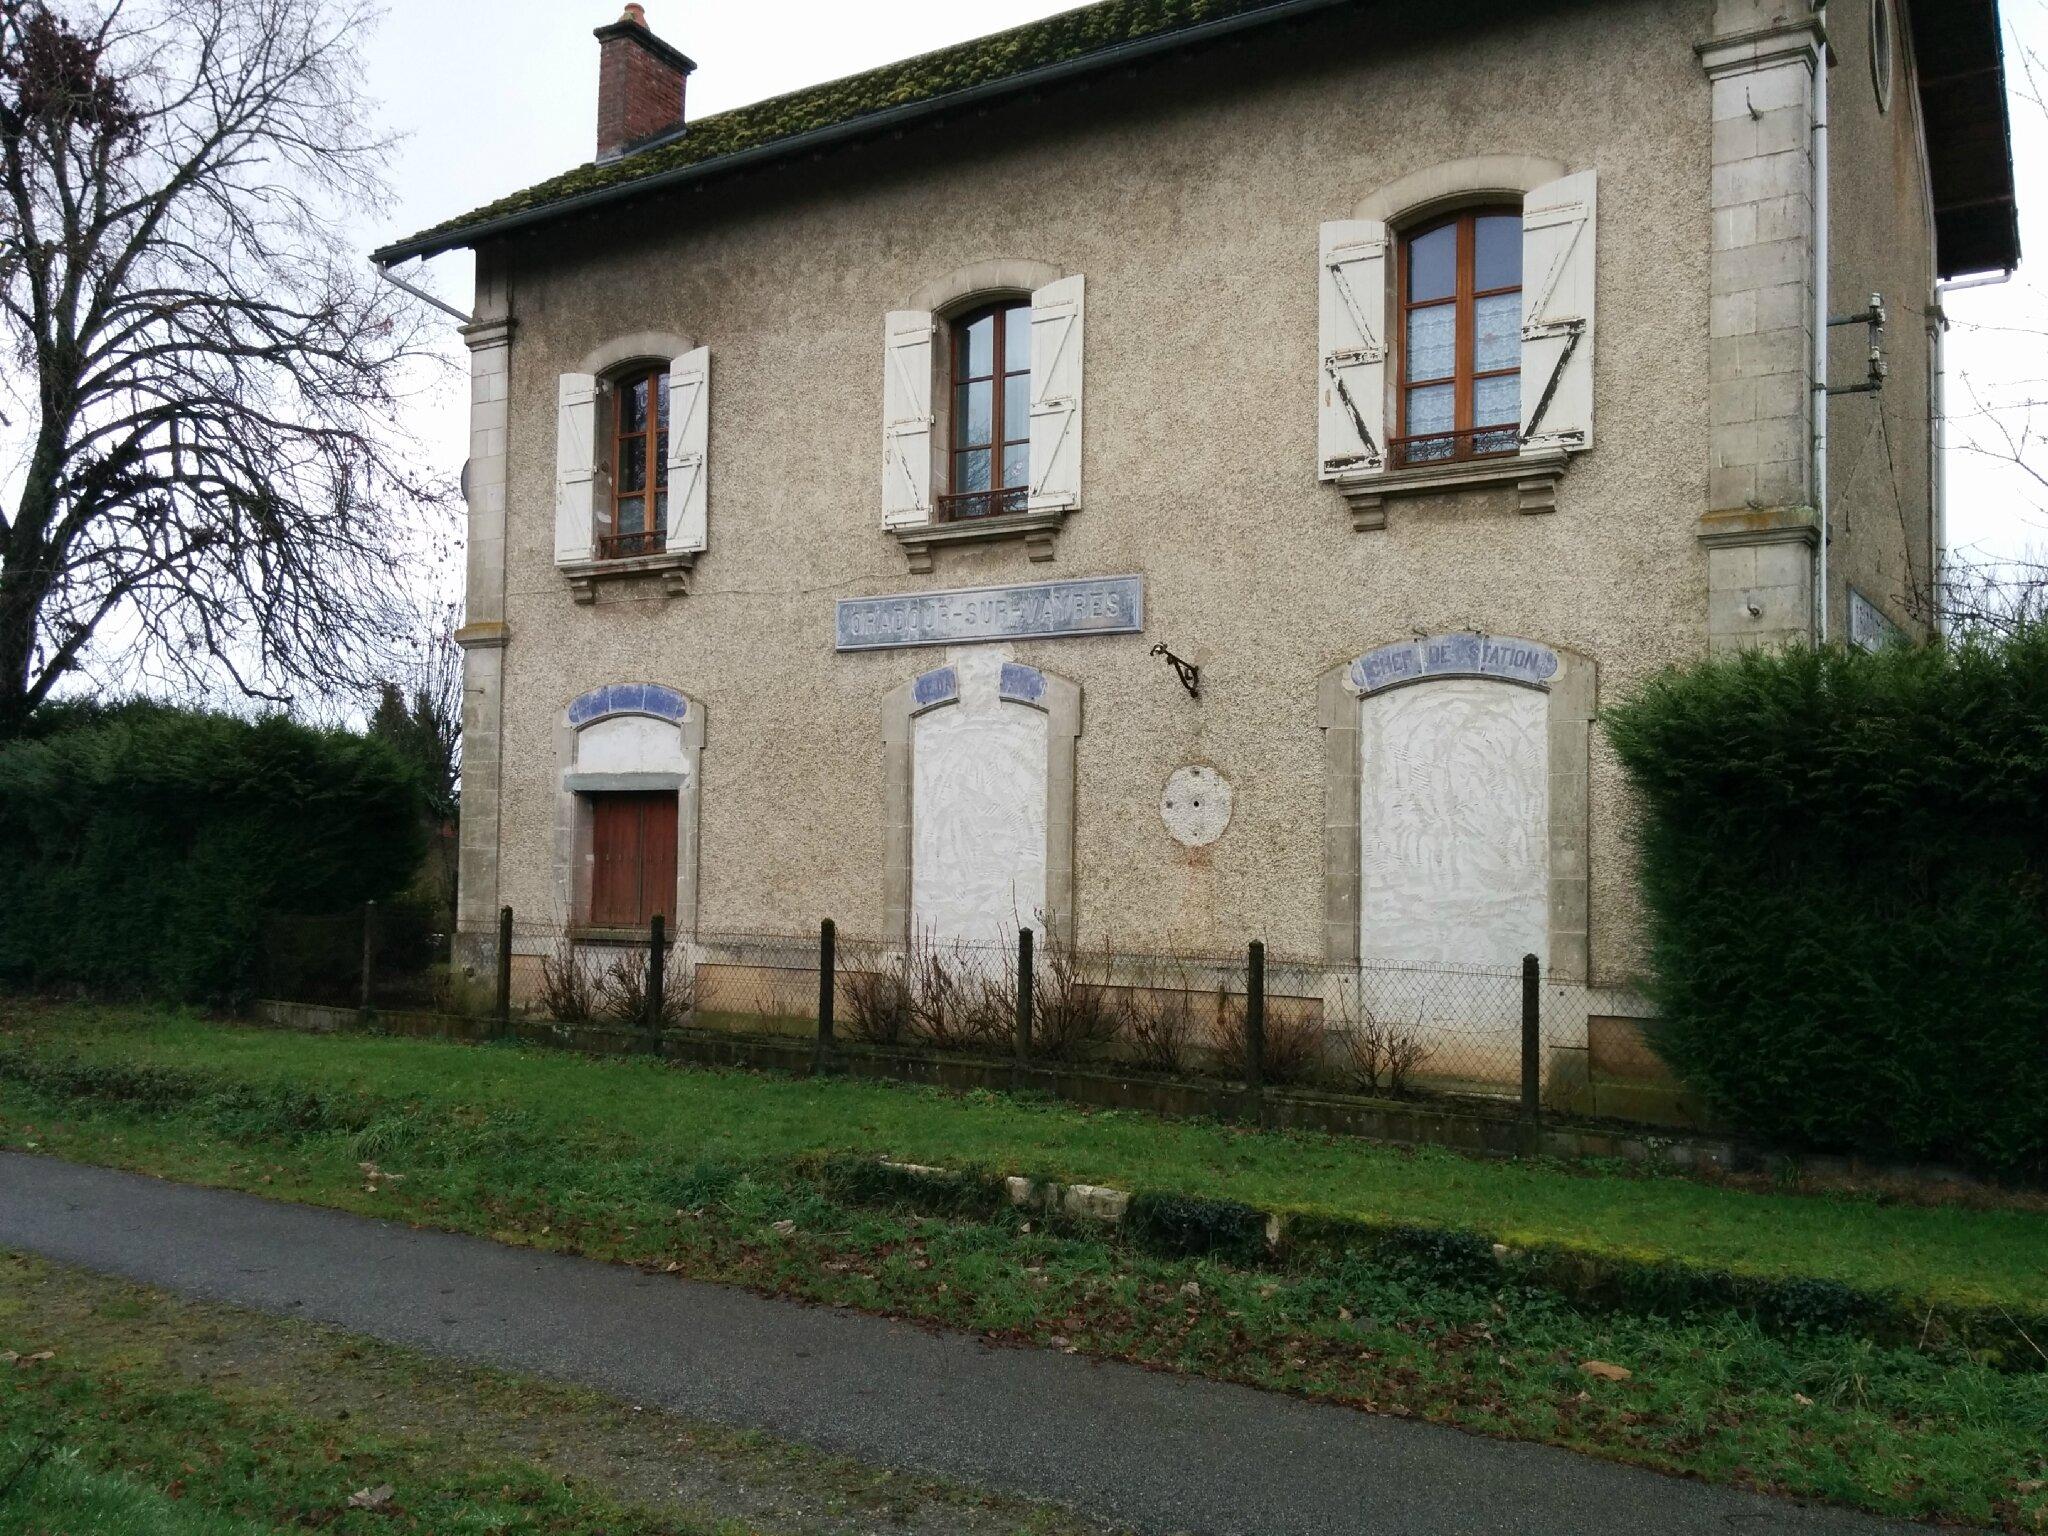 Oradour-sur-Vayres (Haute-Vienne) 1